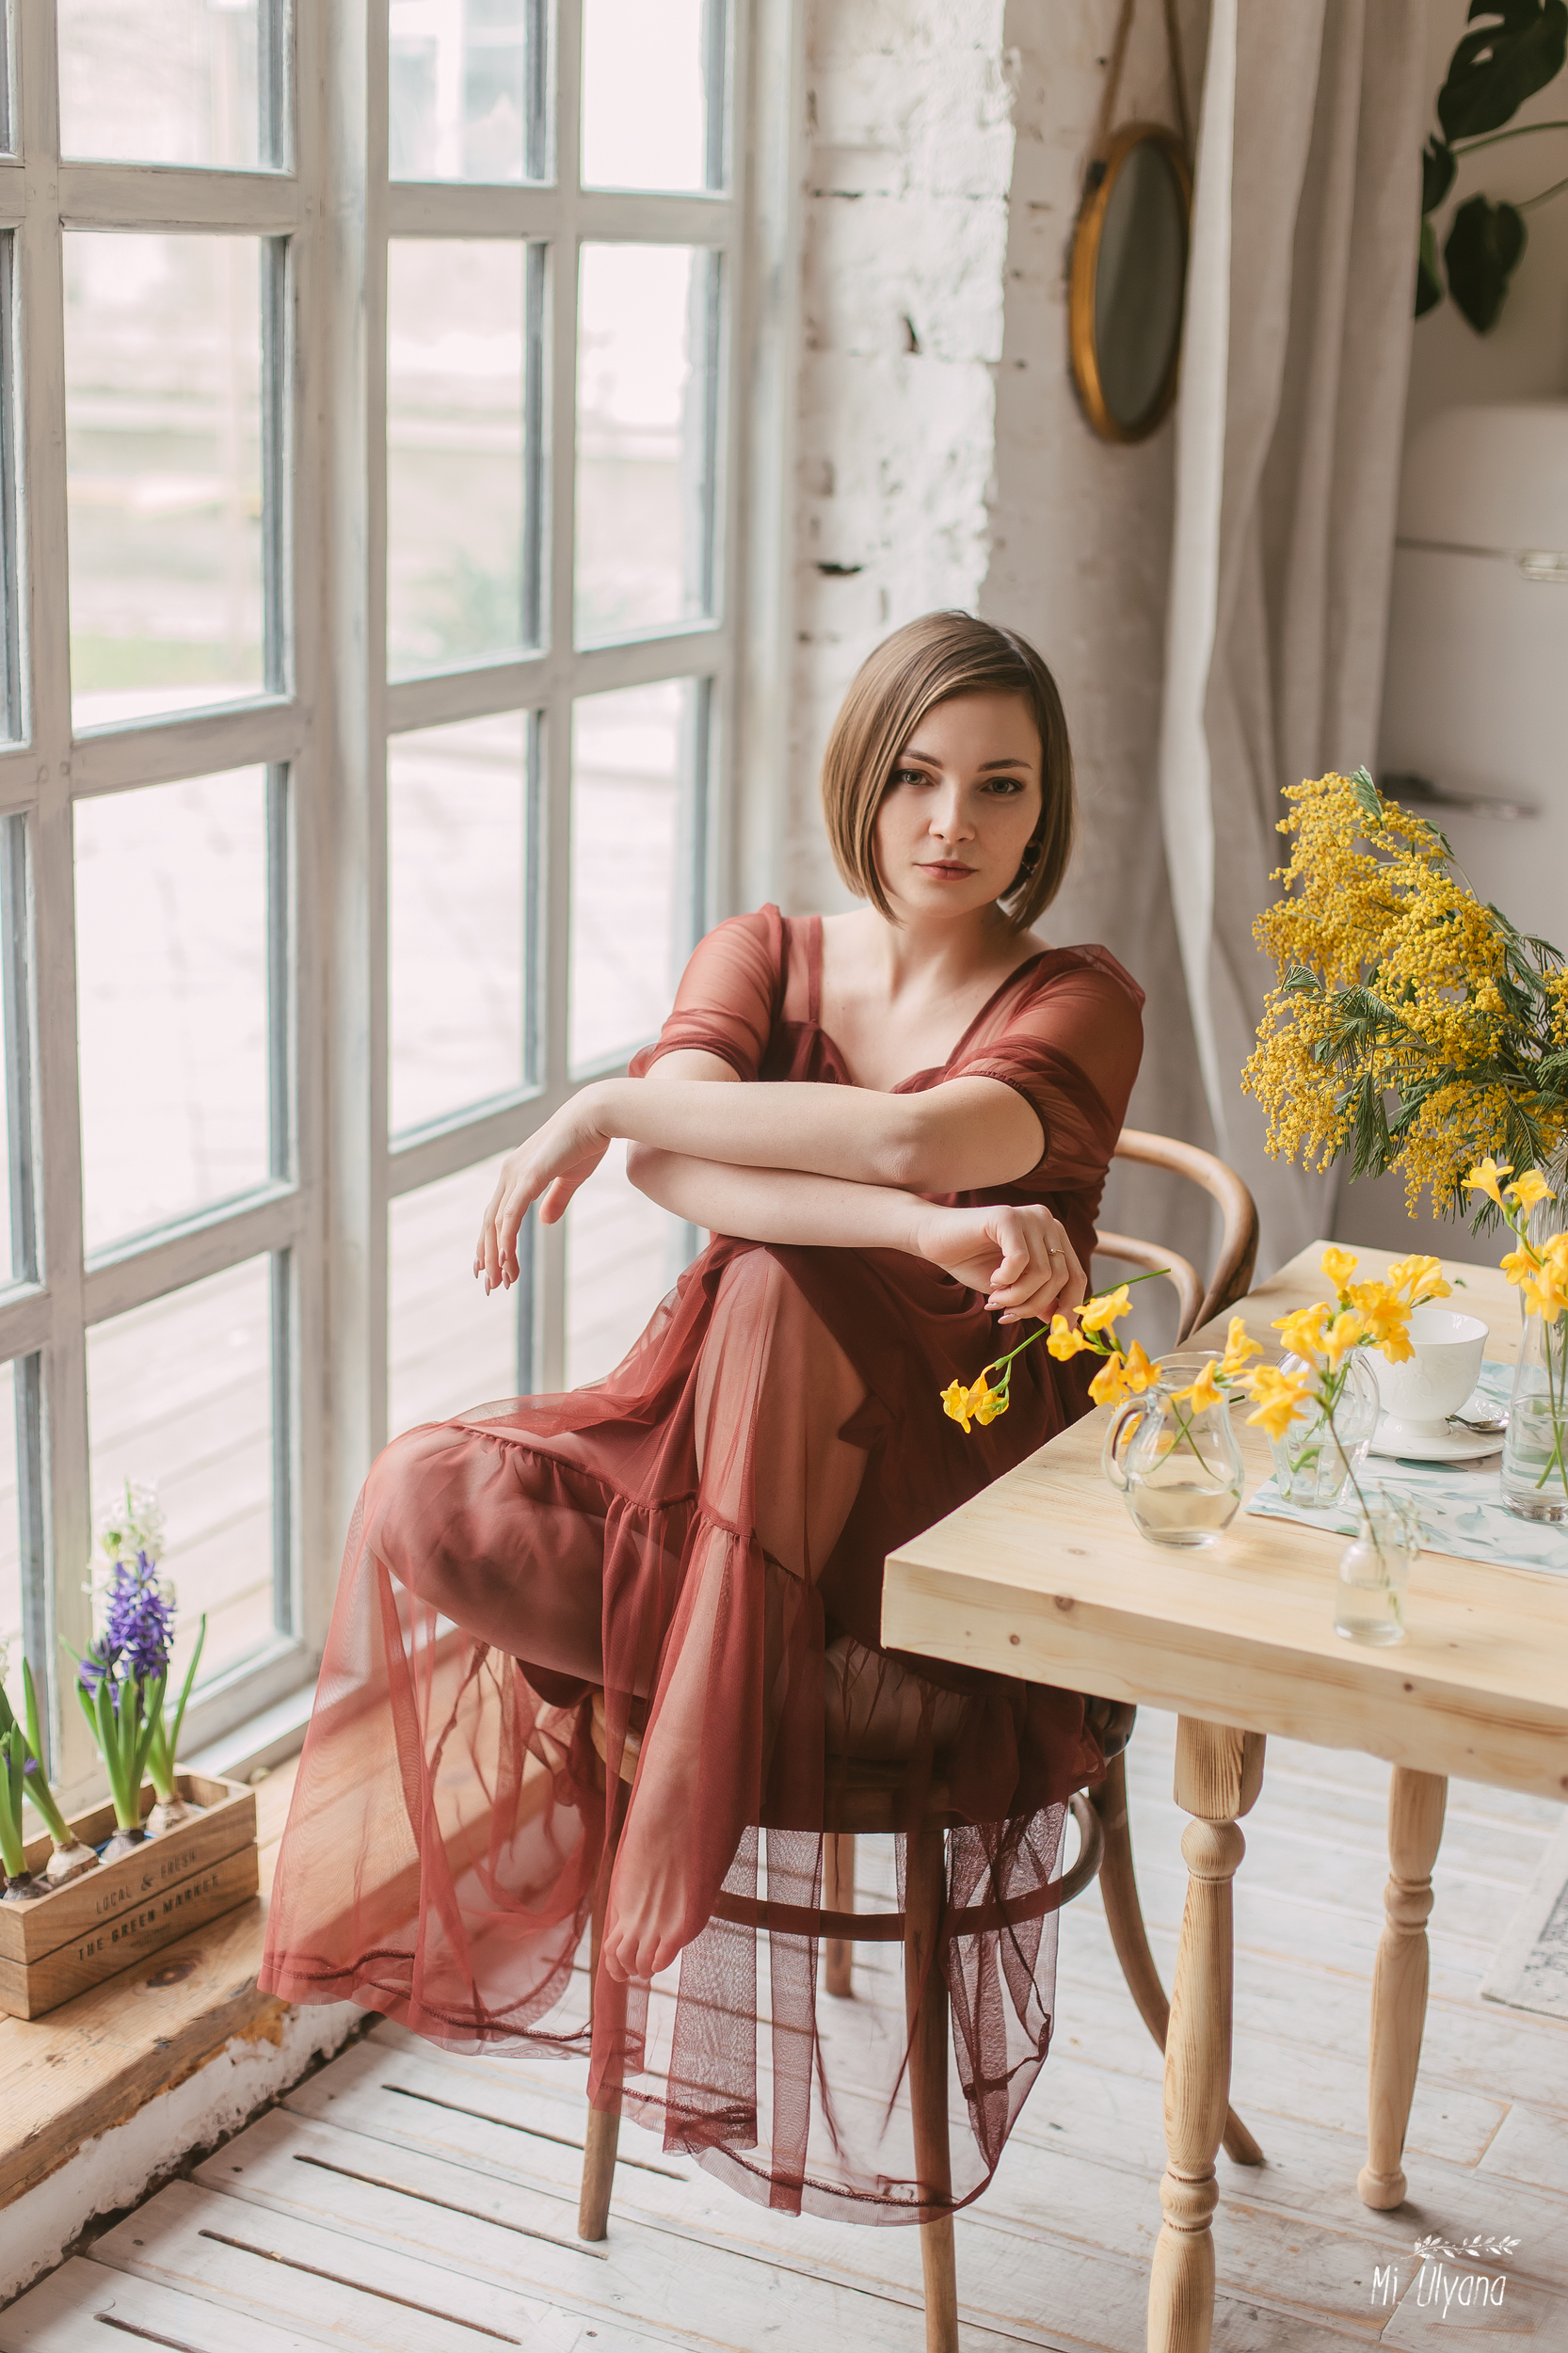 Март / фотограф Ульяна Буканова (Мизинова)